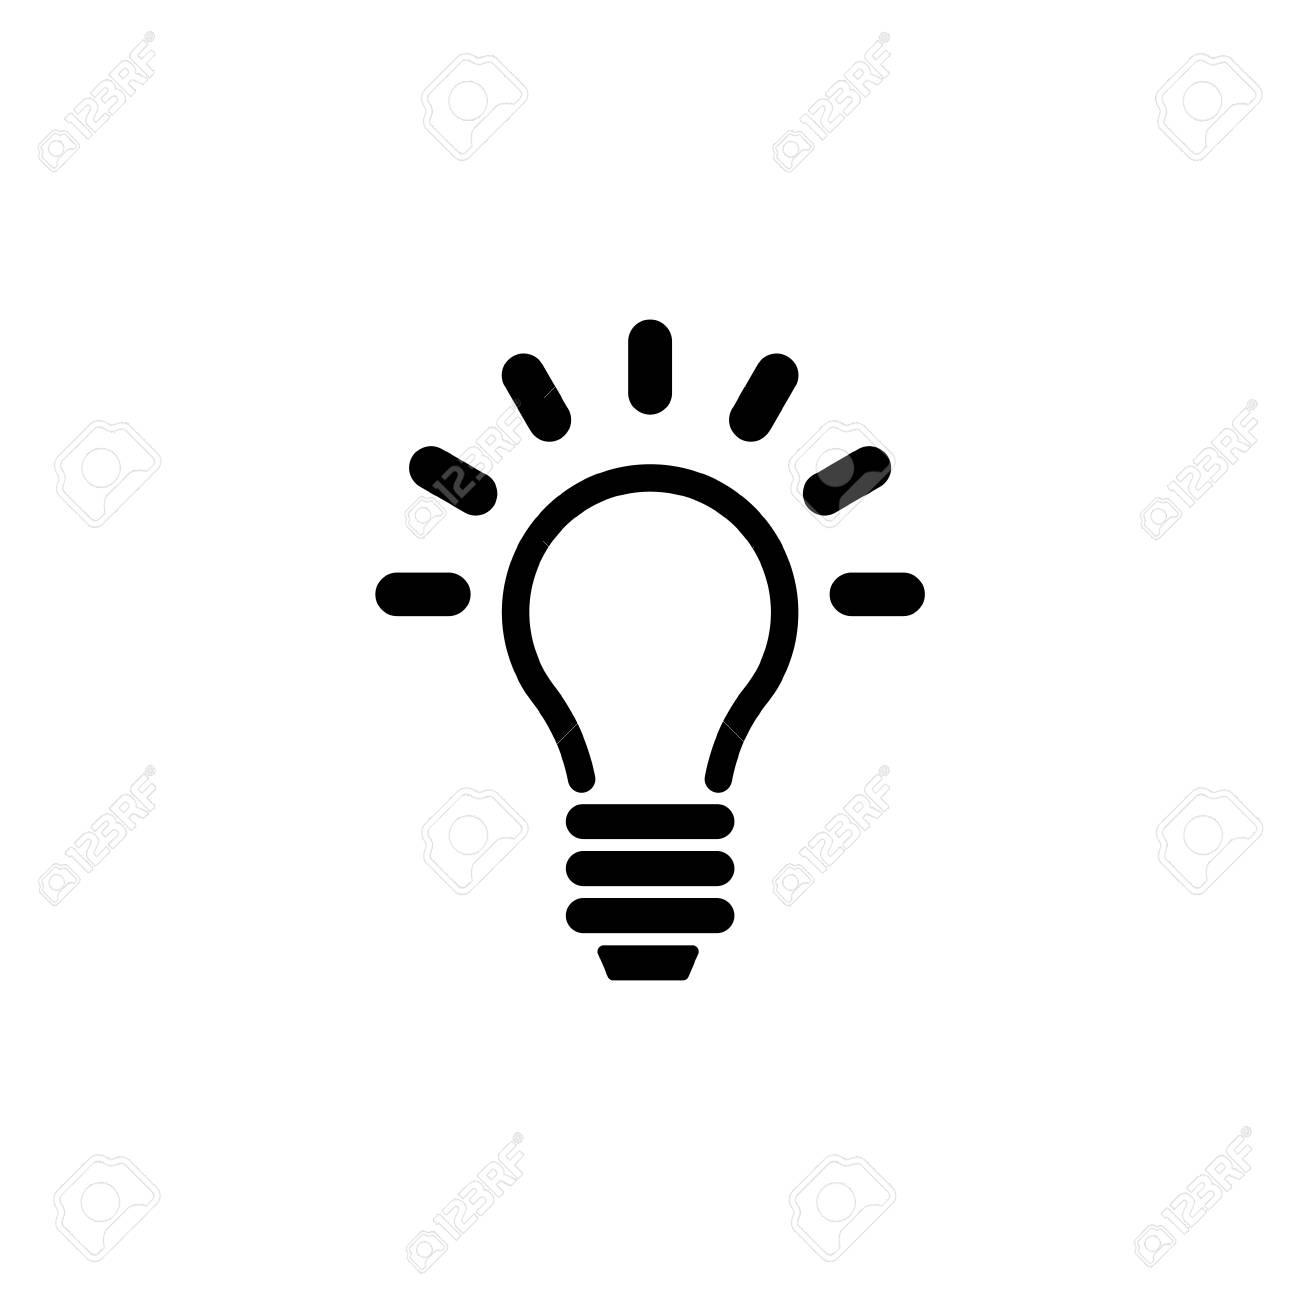 Lamp, Light Bulb, Idea. Flat Vector Icon illustration. Simple black symbol on white background. Lamp, Light Bulb, Idea sign design template for web and mobile UI element - 105626775